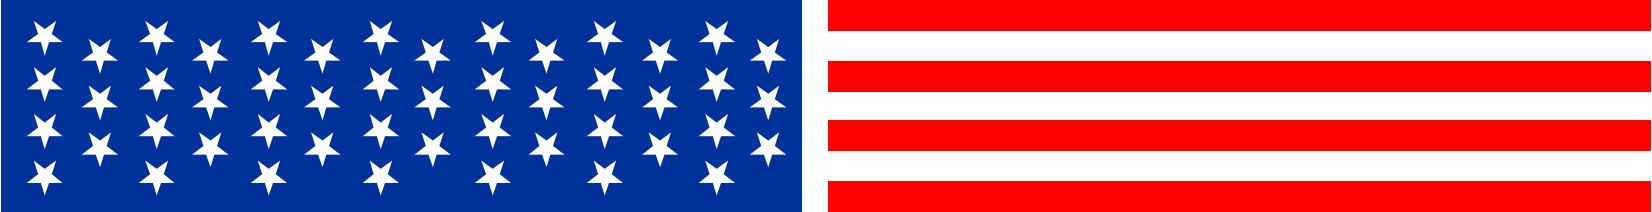 americana-bar-5